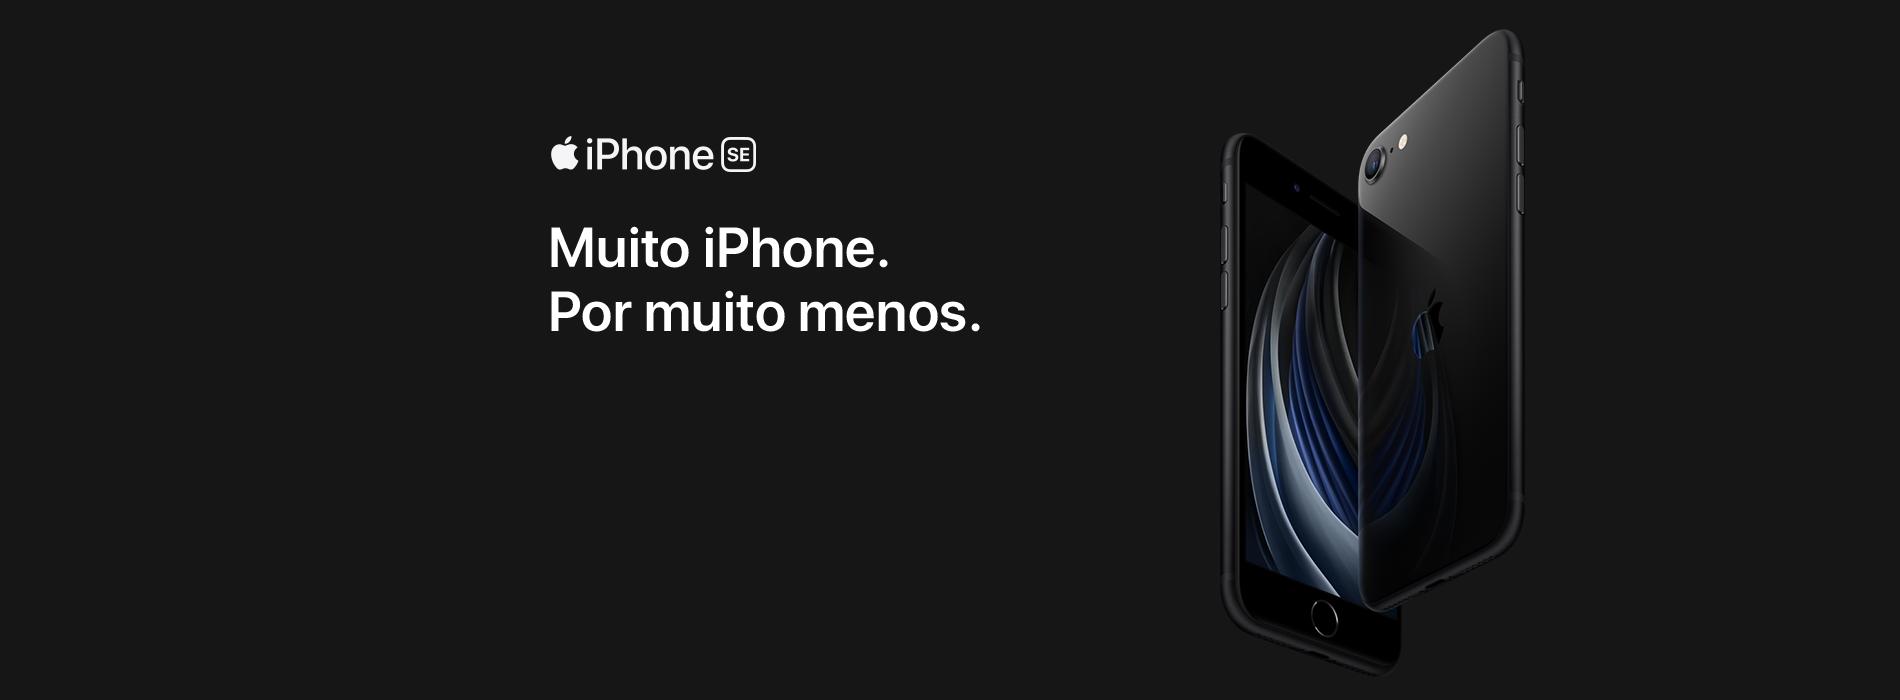 Homepage Slideshow - Comprar iPhone SE